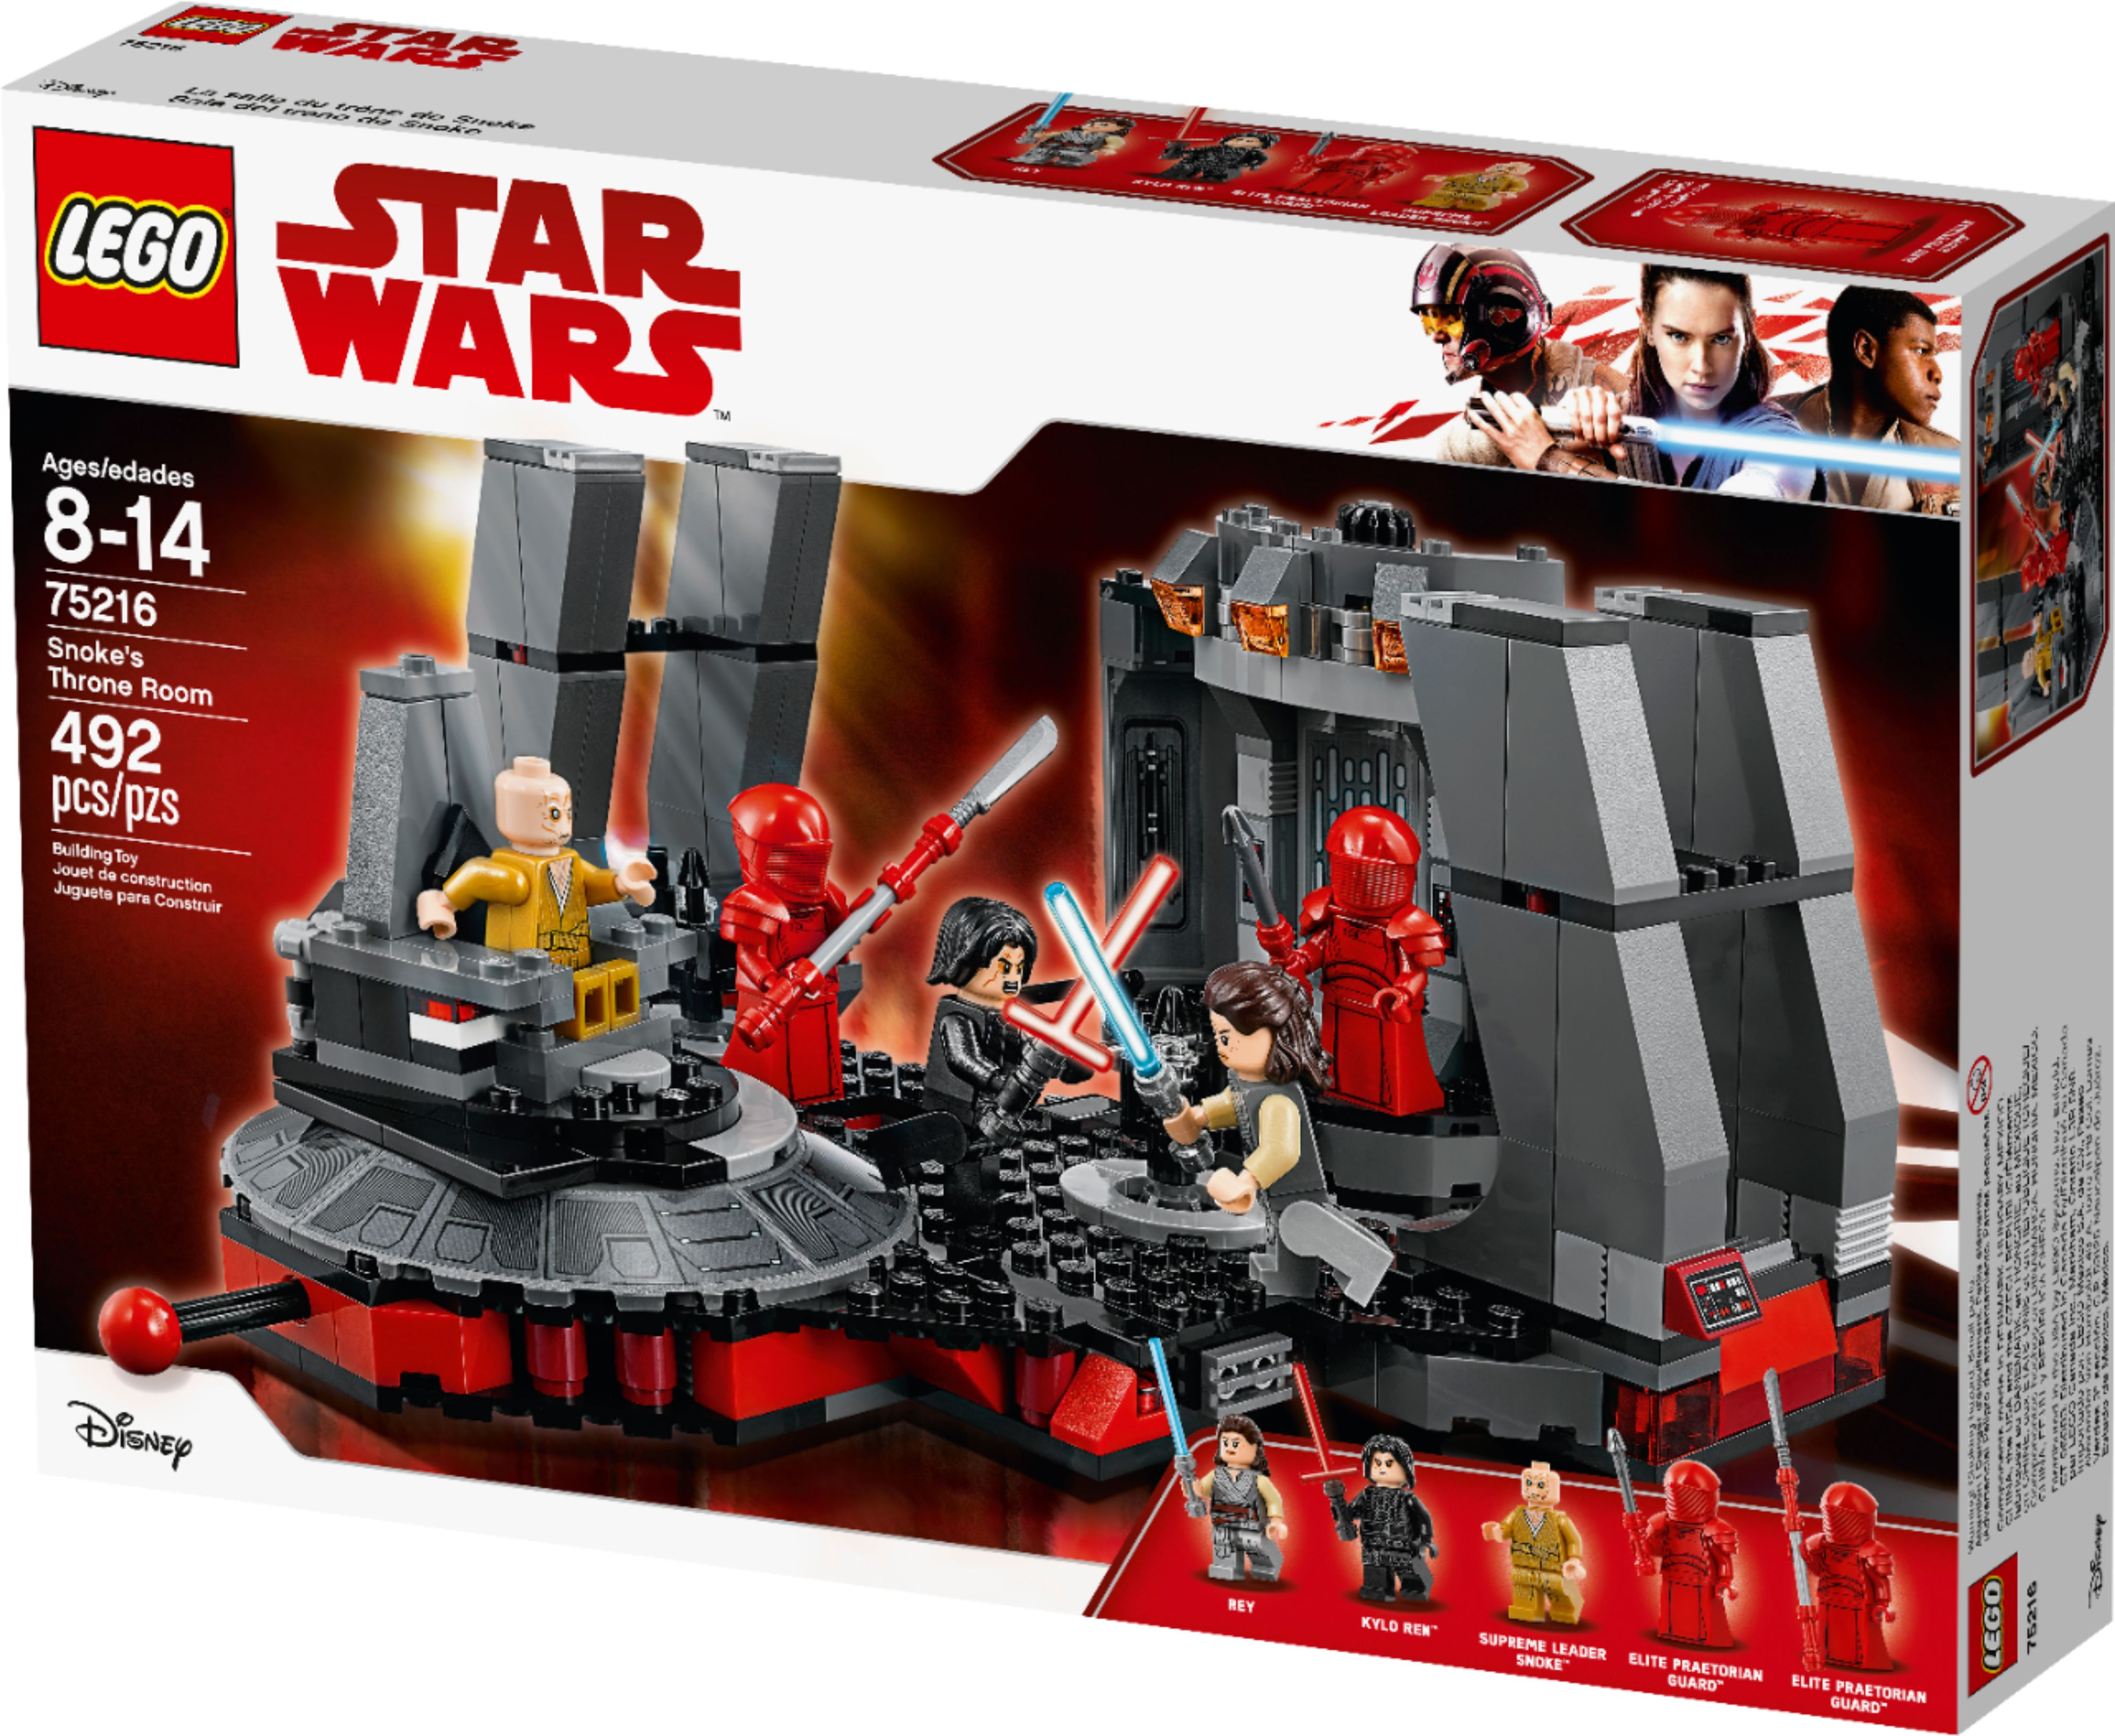 Lego Star Wars Snokes Throne Room 75216